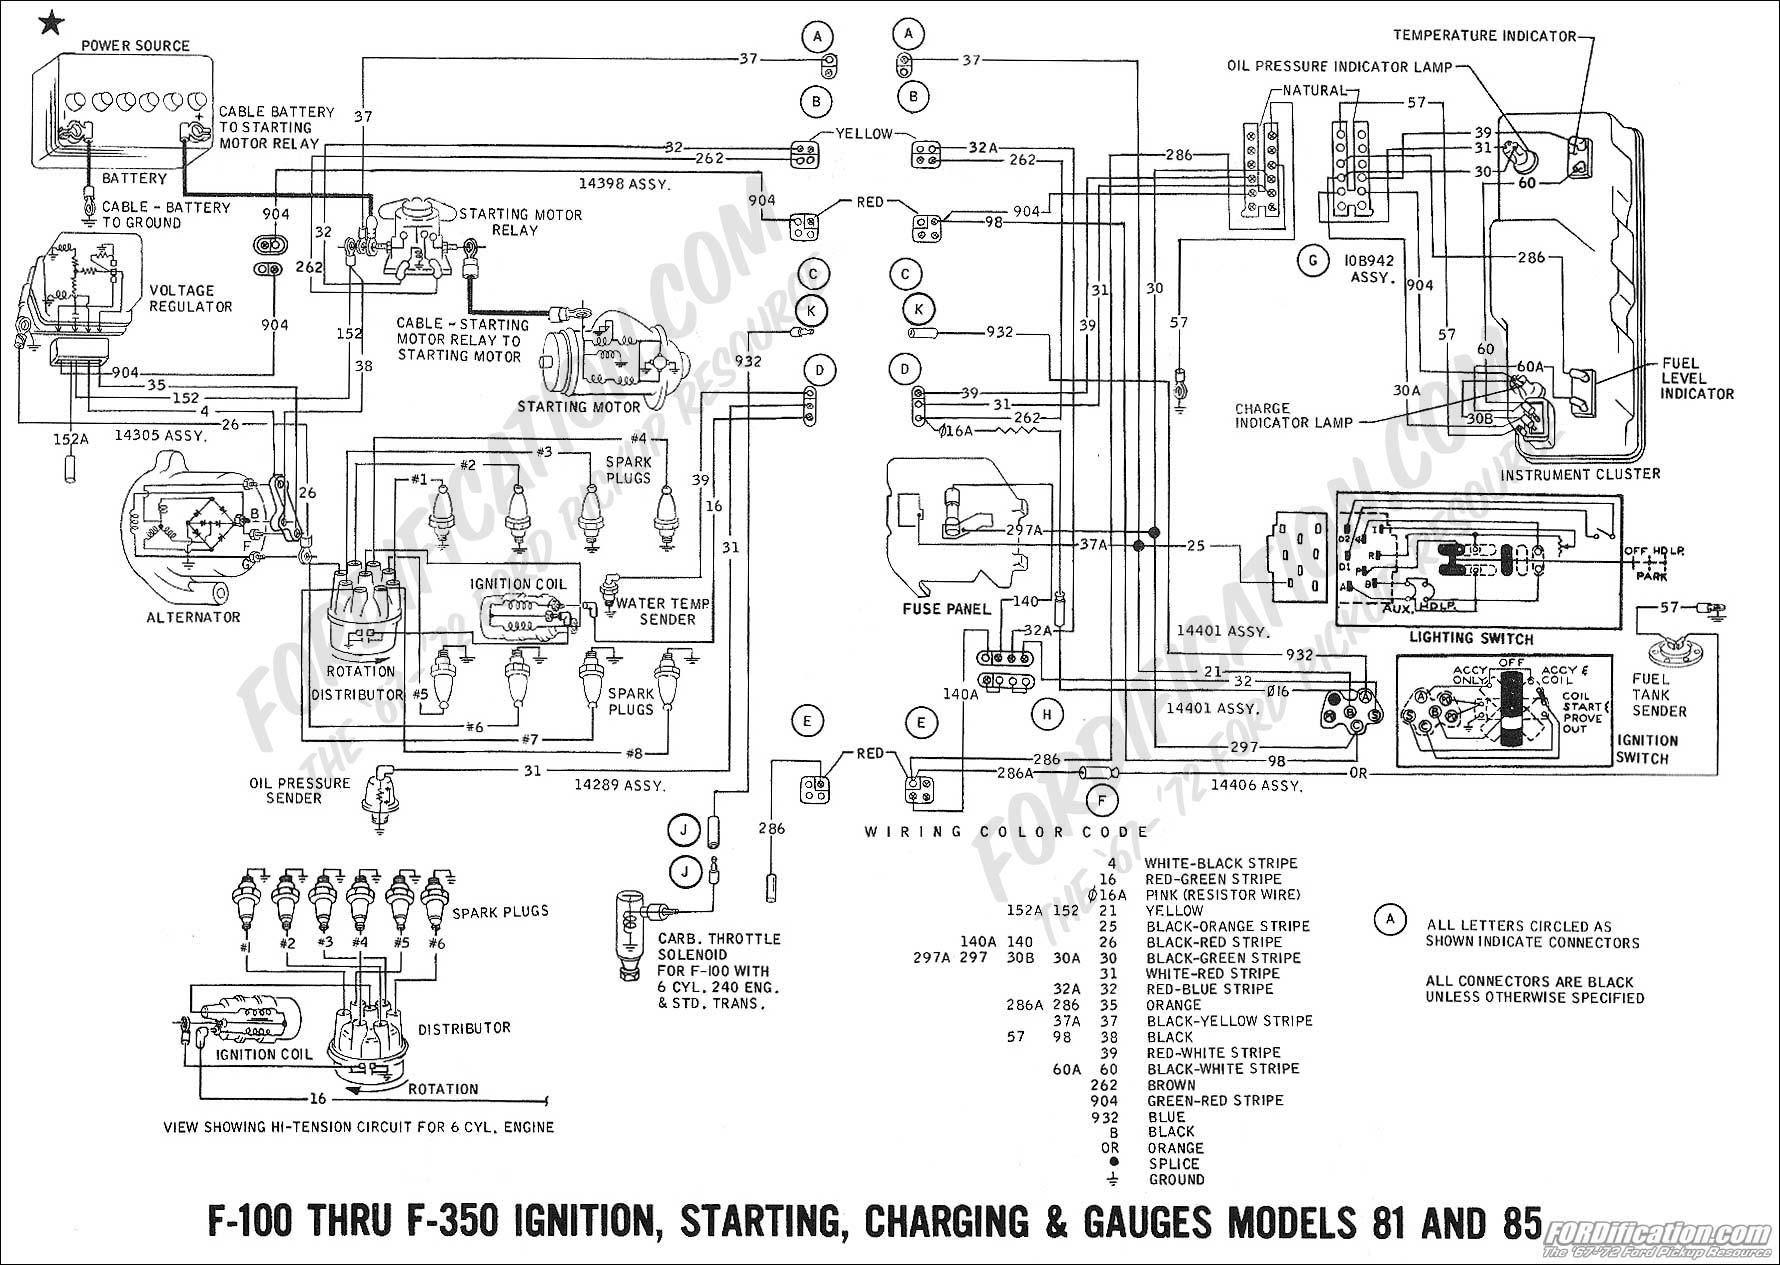 1987 Ford F800 Dump Truck Wiring Diagram | Ford F800 Truck Wiring Diagrams |  | artedaprincesona.blogspot.com